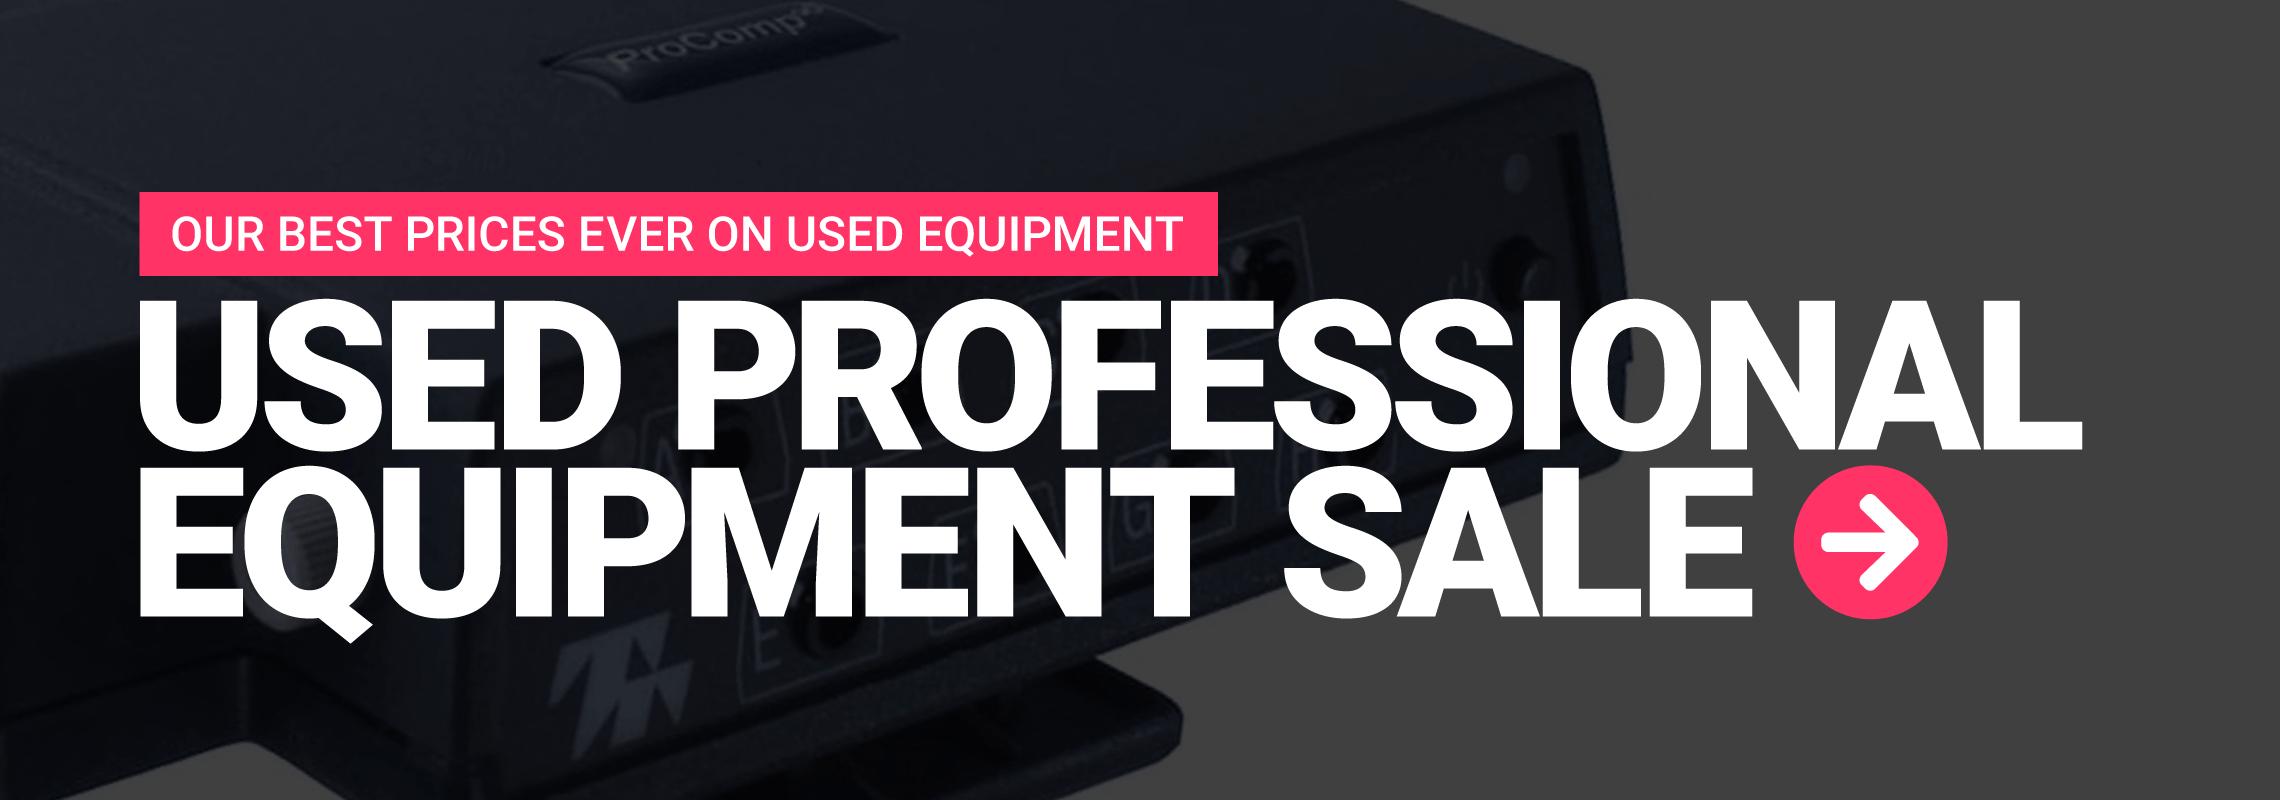 Used Professional Equipment Sale